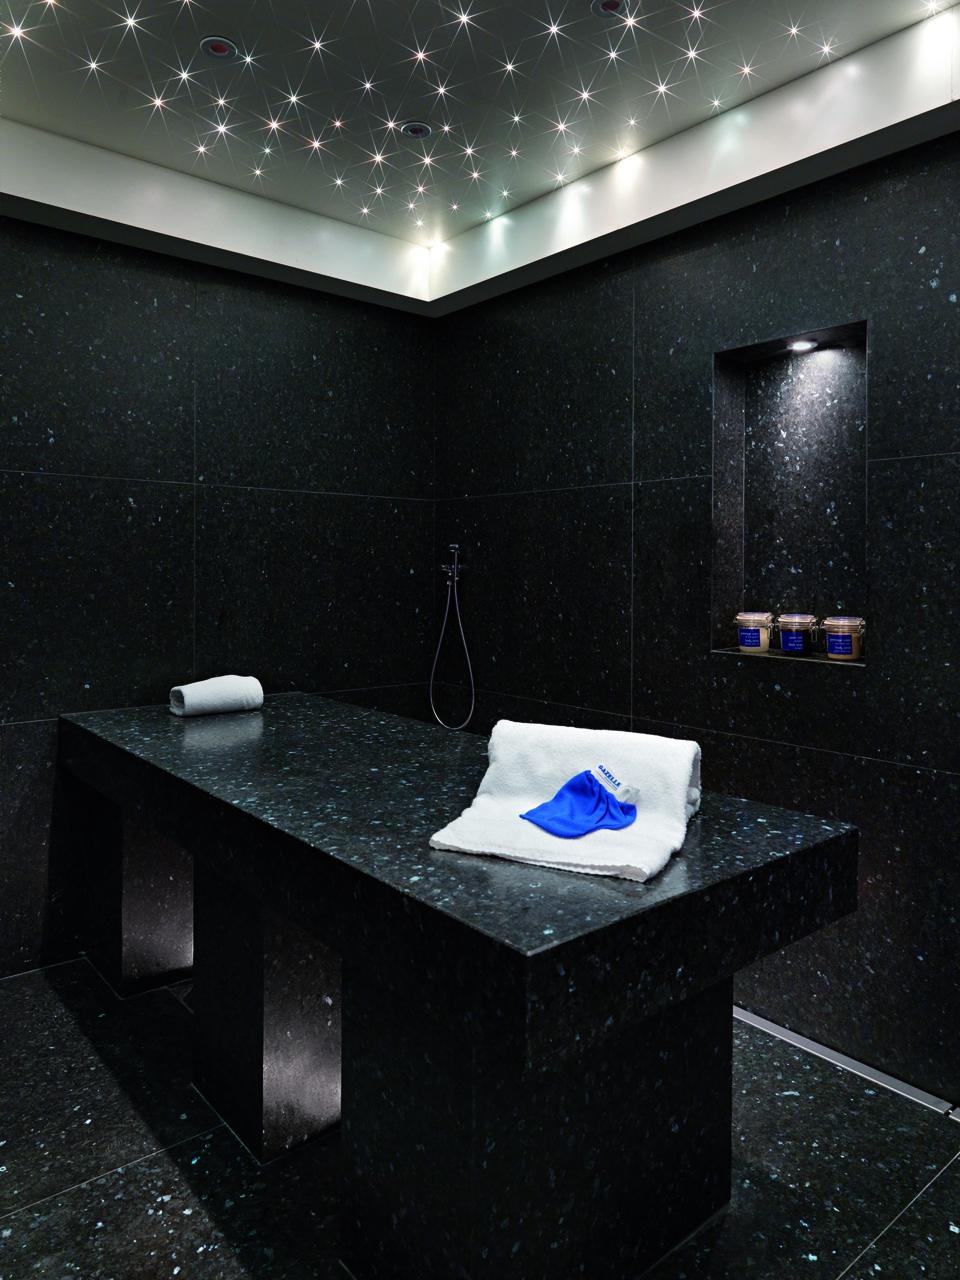 le spa biguine une adresse retenir deedee. Black Bedroom Furniture Sets. Home Design Ideas